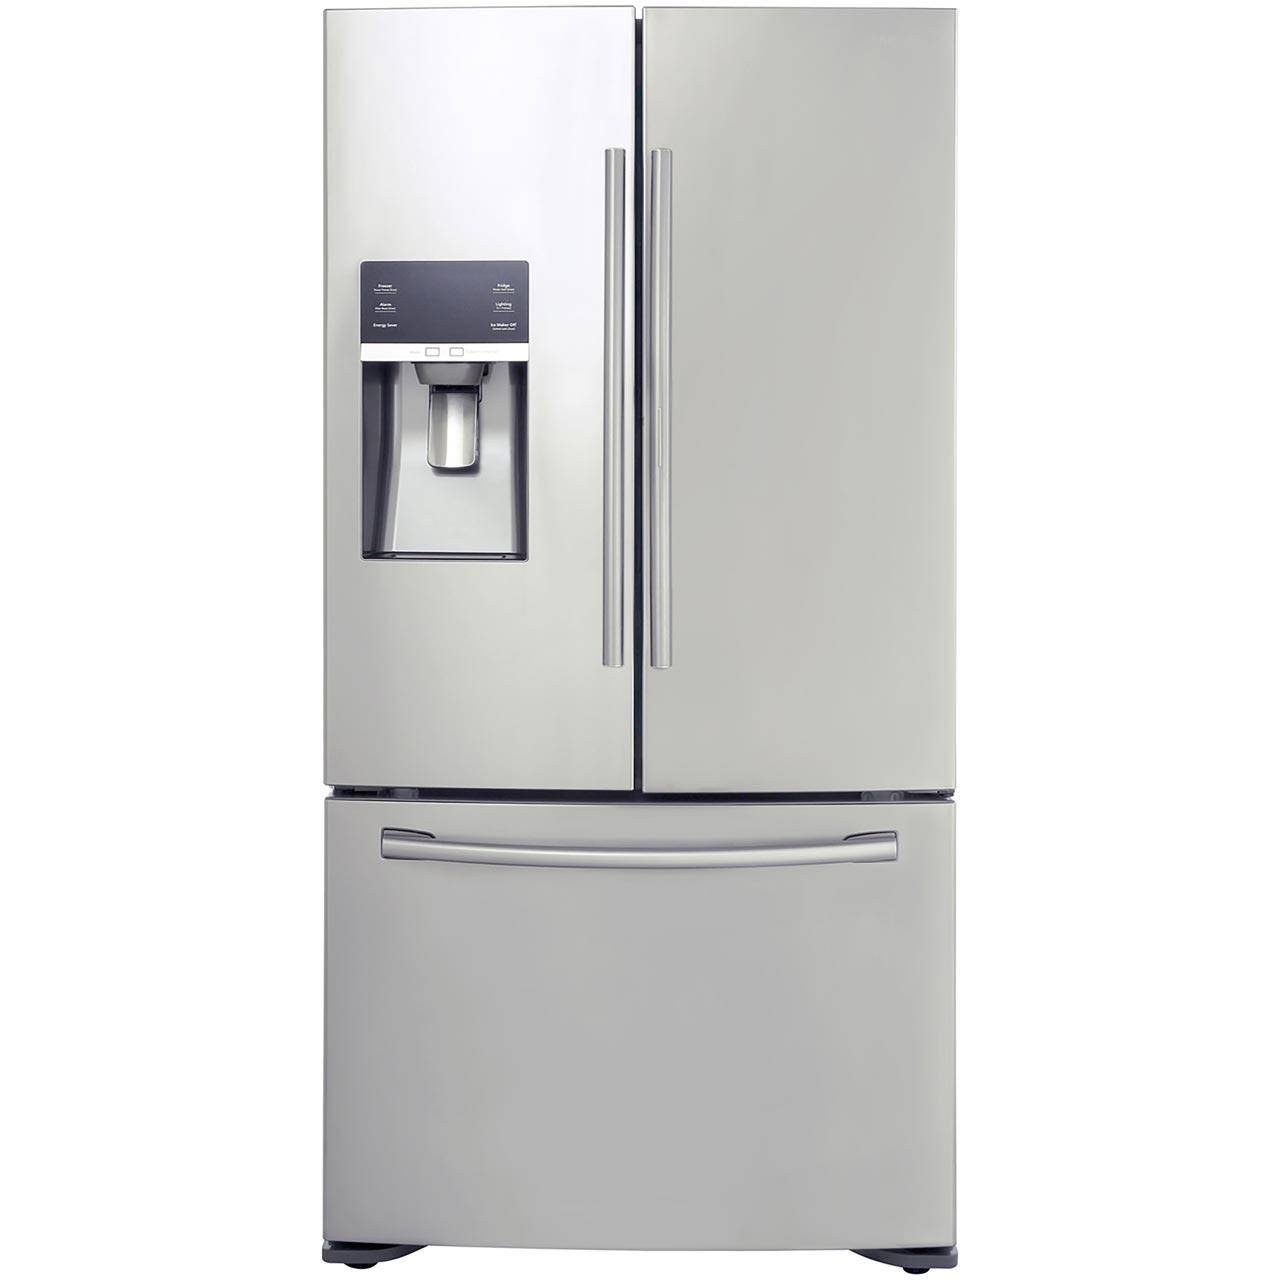 Samsung RF23HTEDBSR Free Standing American Fridge Freezer in Stainless Steel